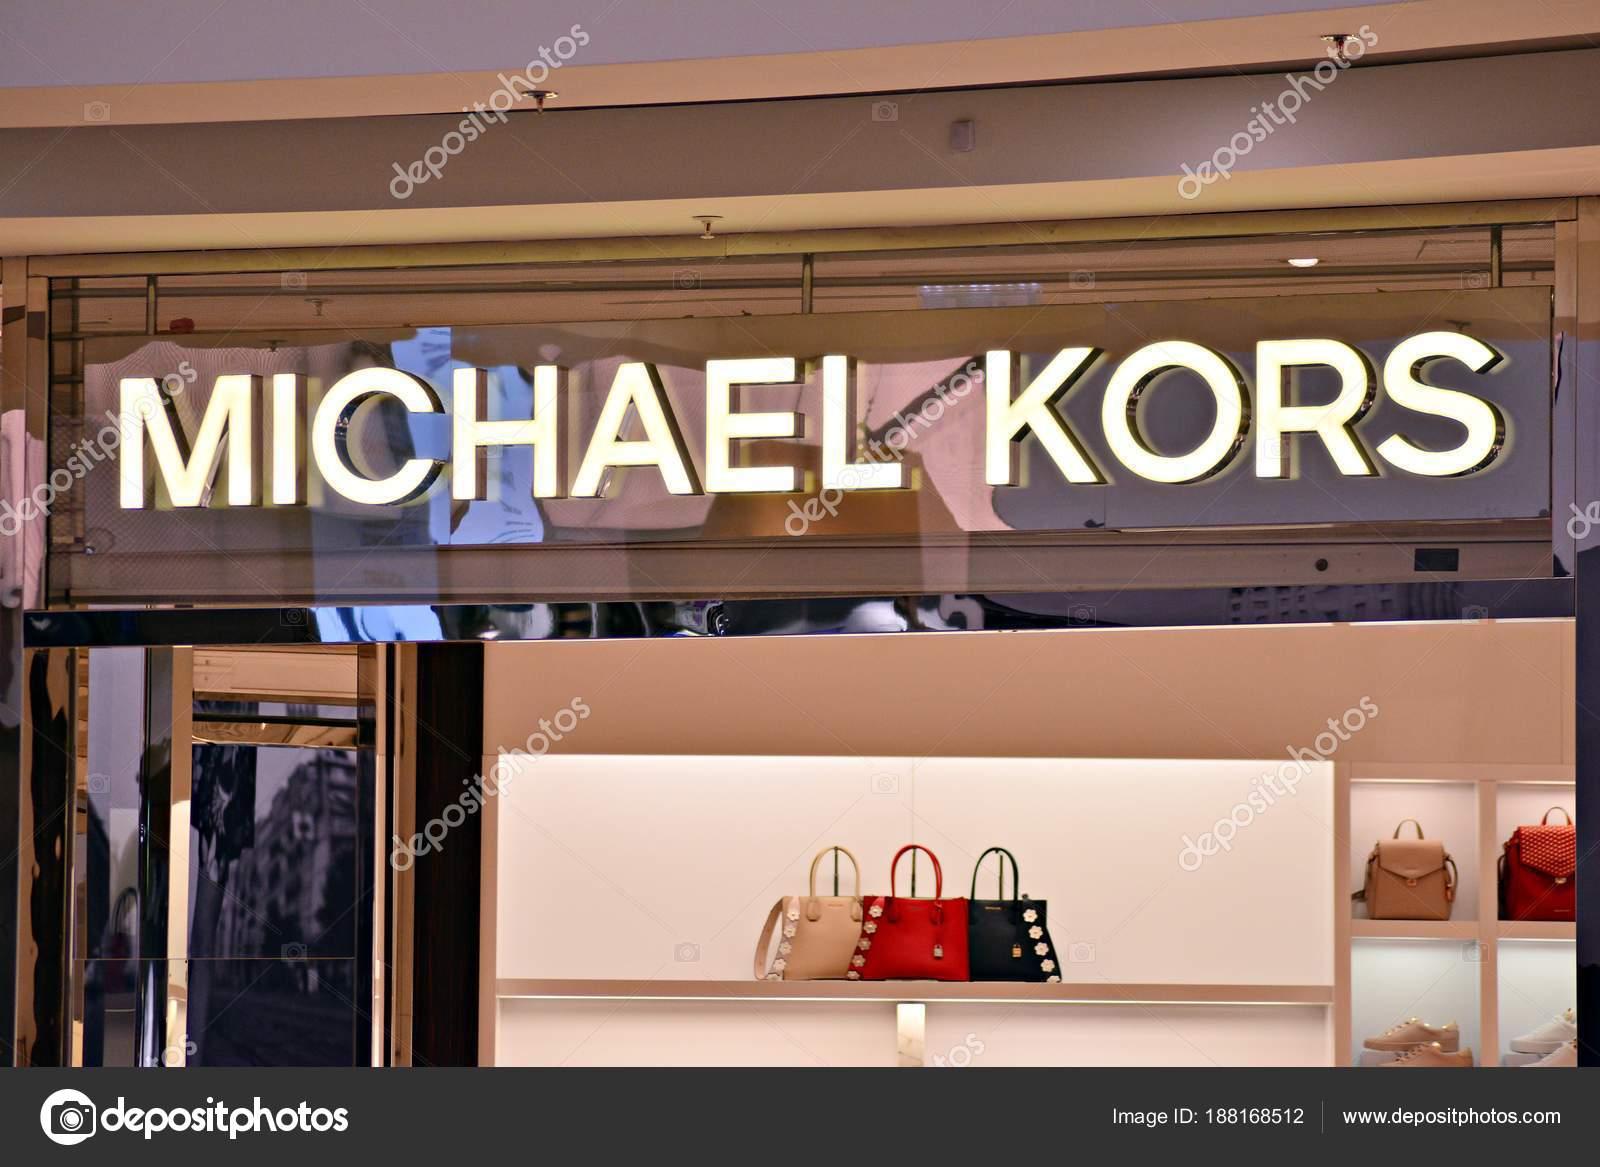 fe1c7352d7db3 Varsovia Polonia Marzo 2018 Firma Michael Kors Letrero Compañía Michael —  Foto de Stock